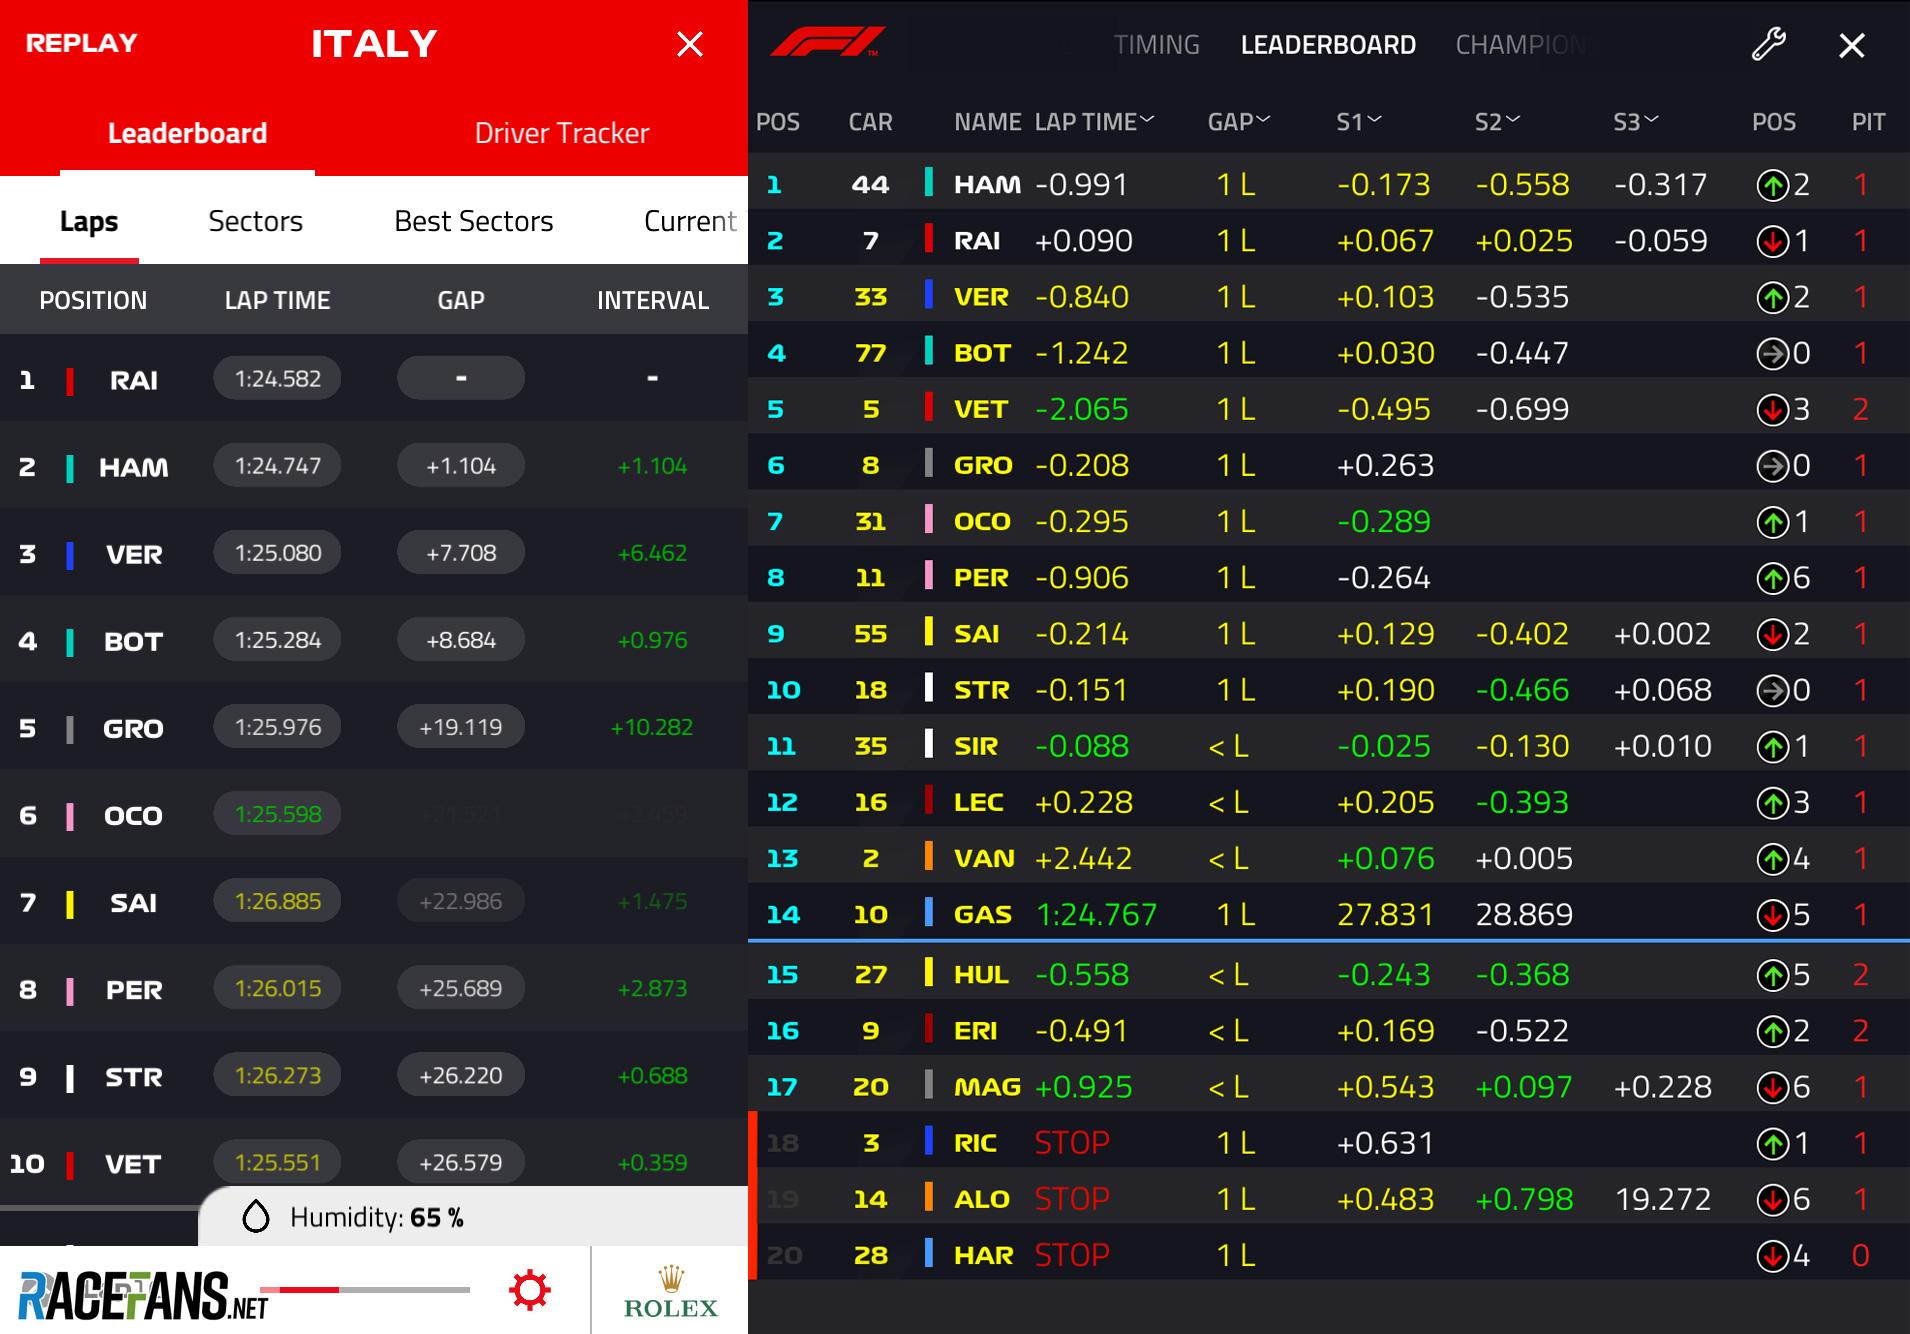 F1 app version 11 and version 10